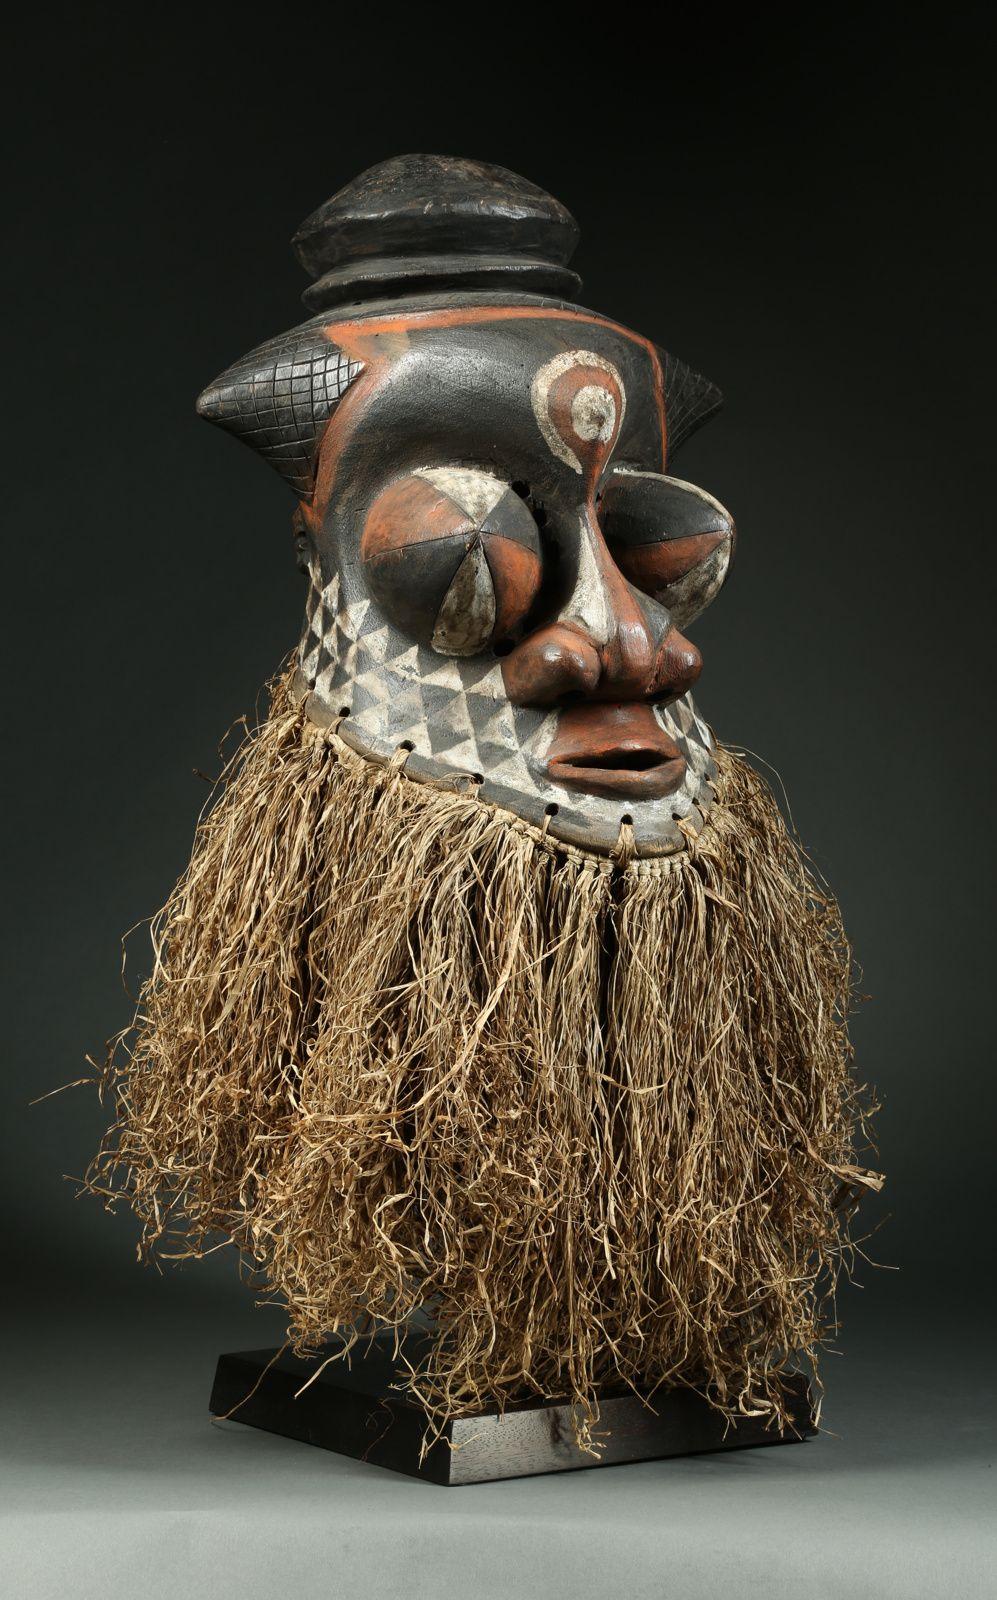 Elite level antique African art gallery, San Francisco Bay